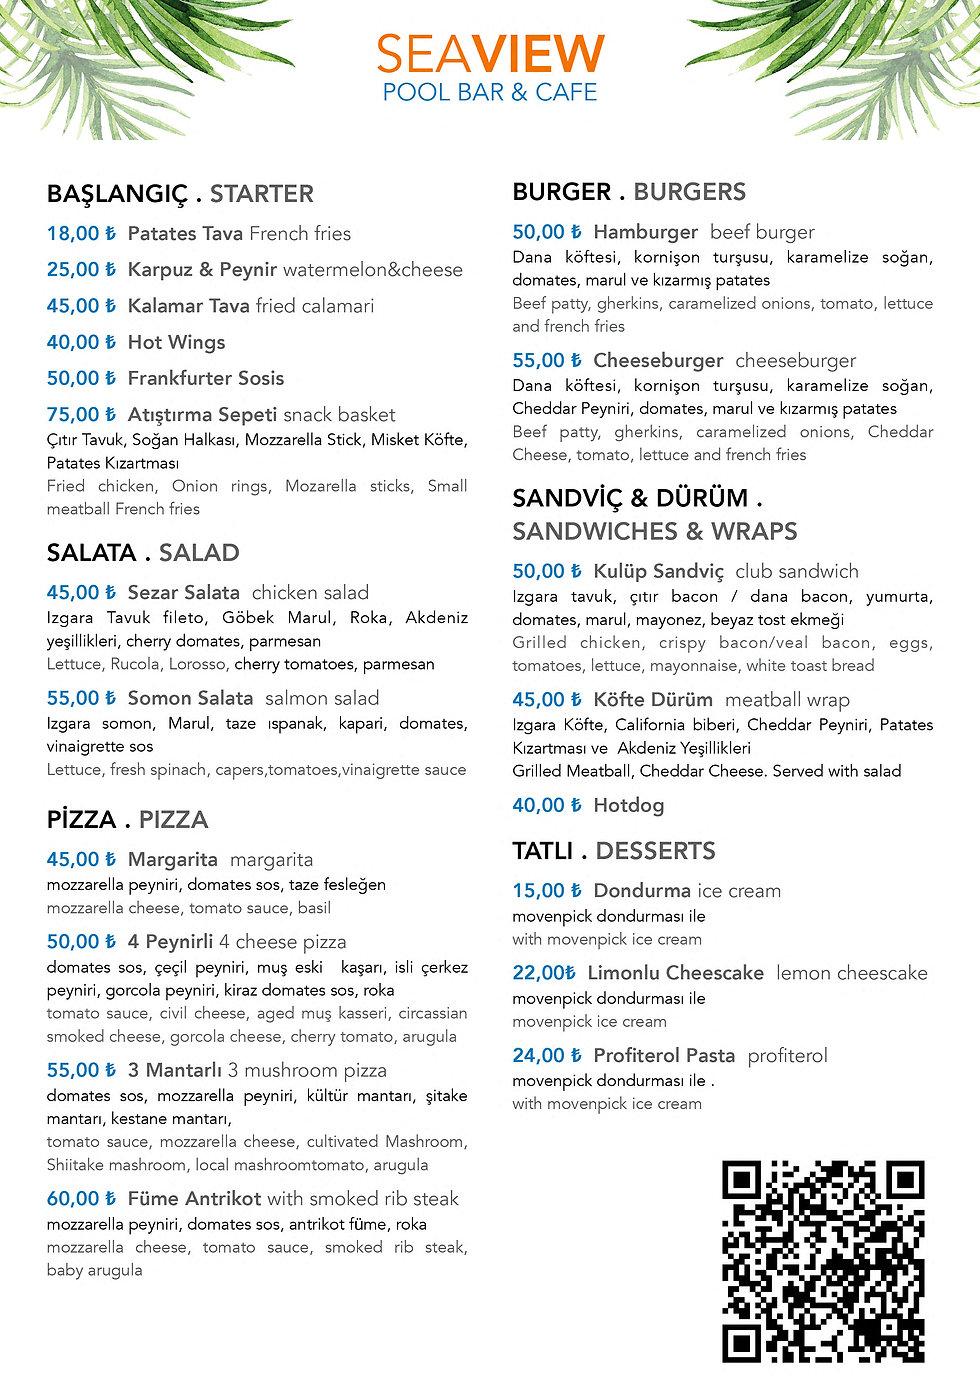 KH SEAVIEW POOL BAR & CAFE 21.08.jpf